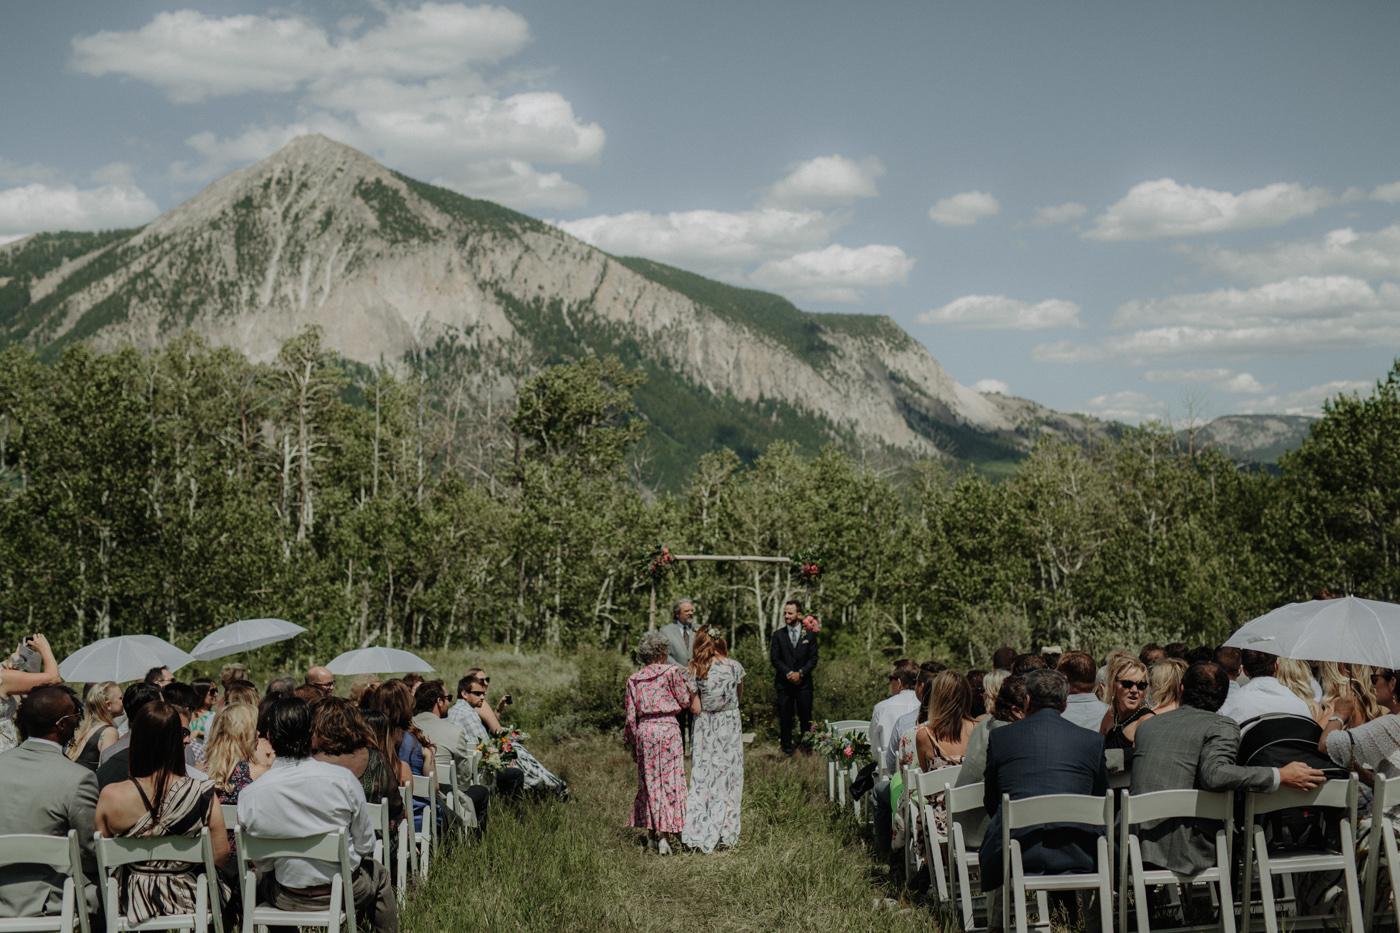 woods-walk-trail-crested-butte-colorado-wedding-26.jpg